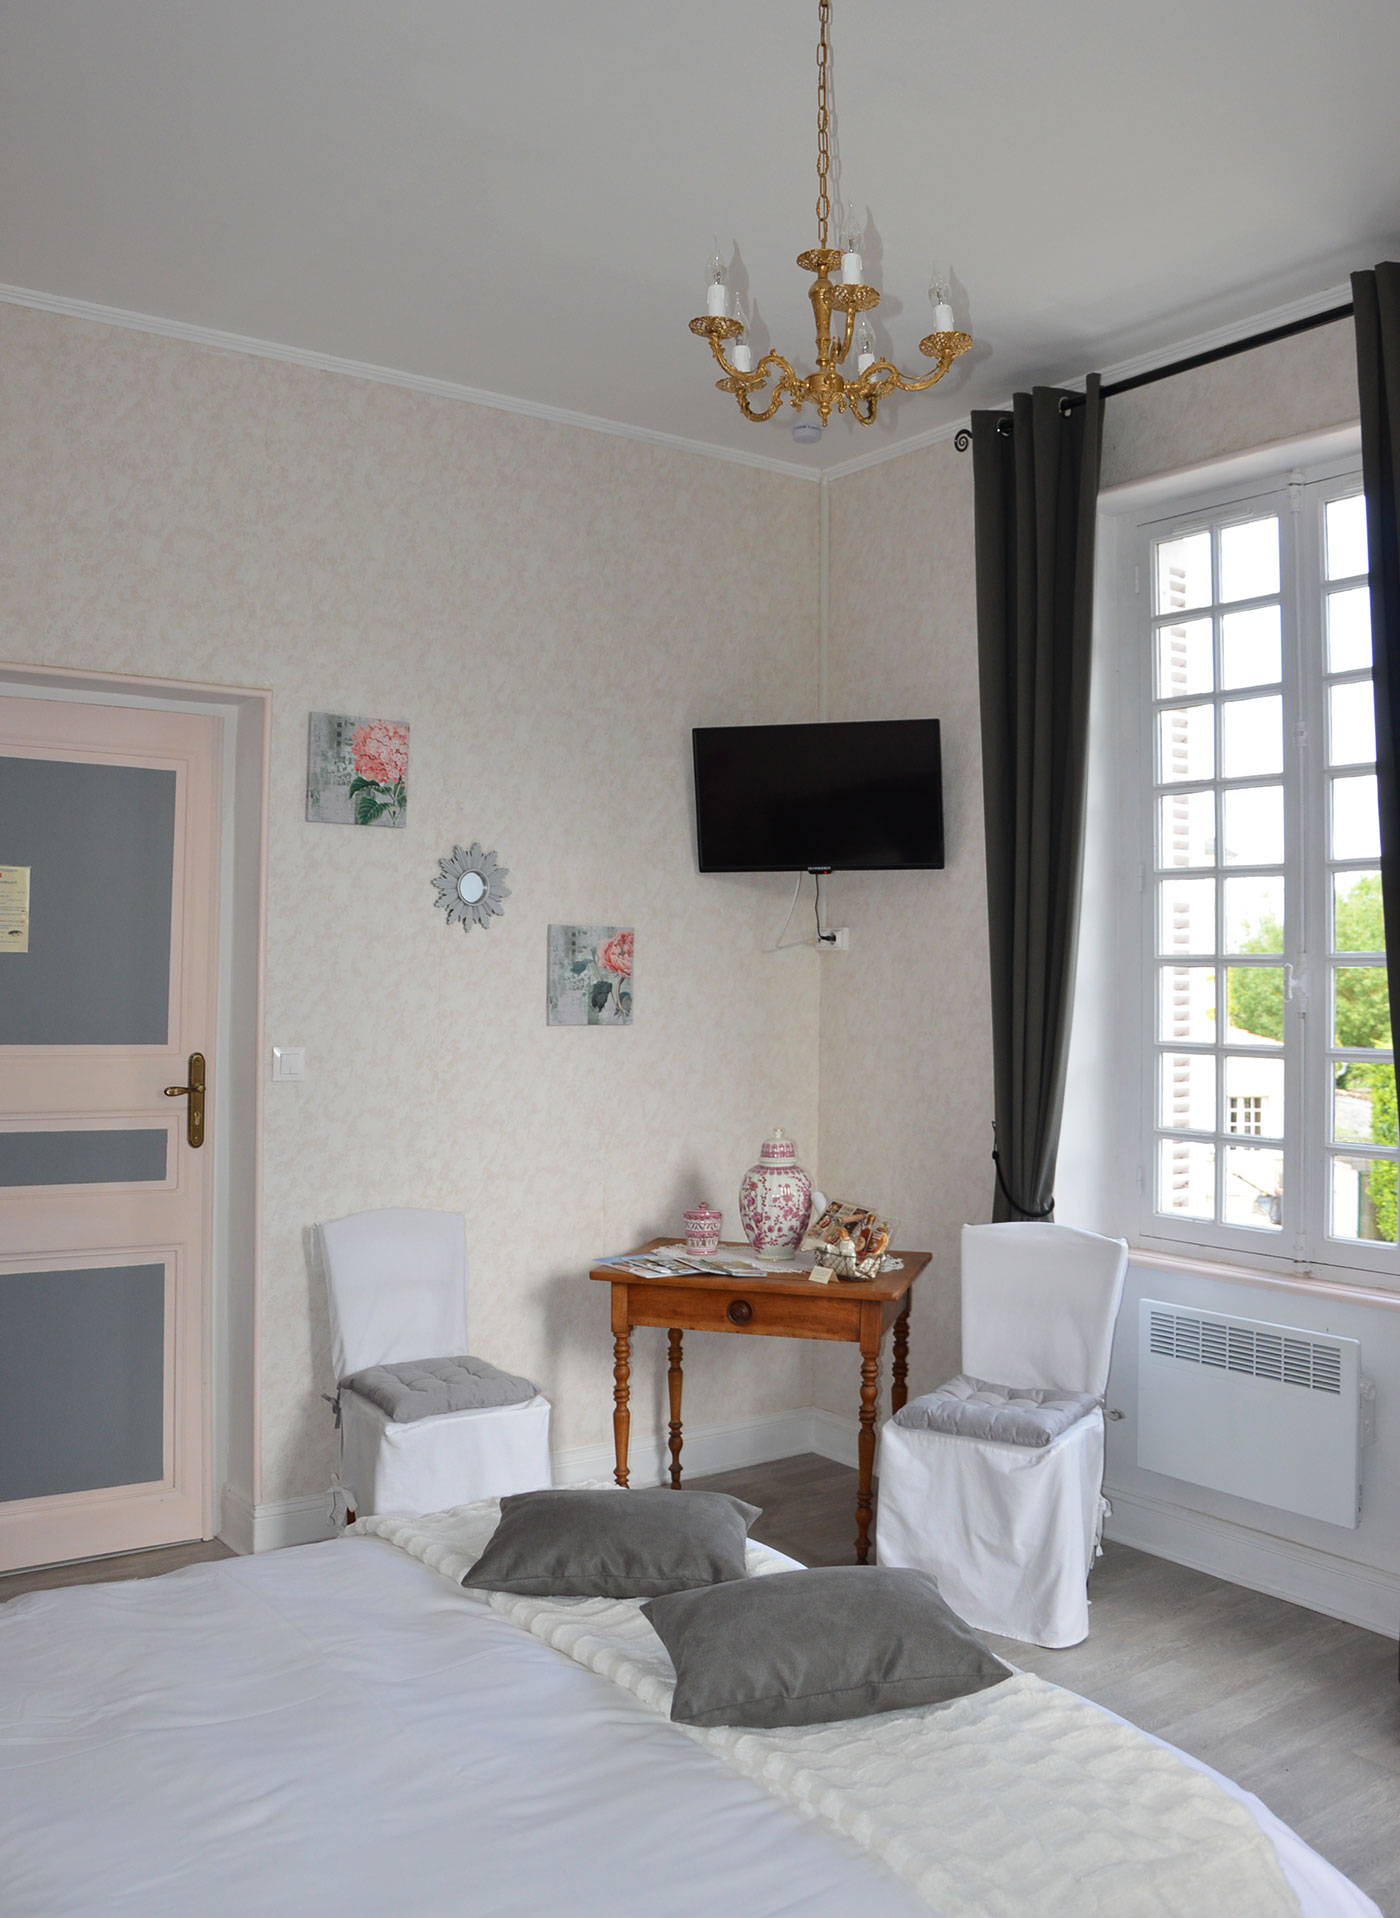 Petite Champagne bedroom